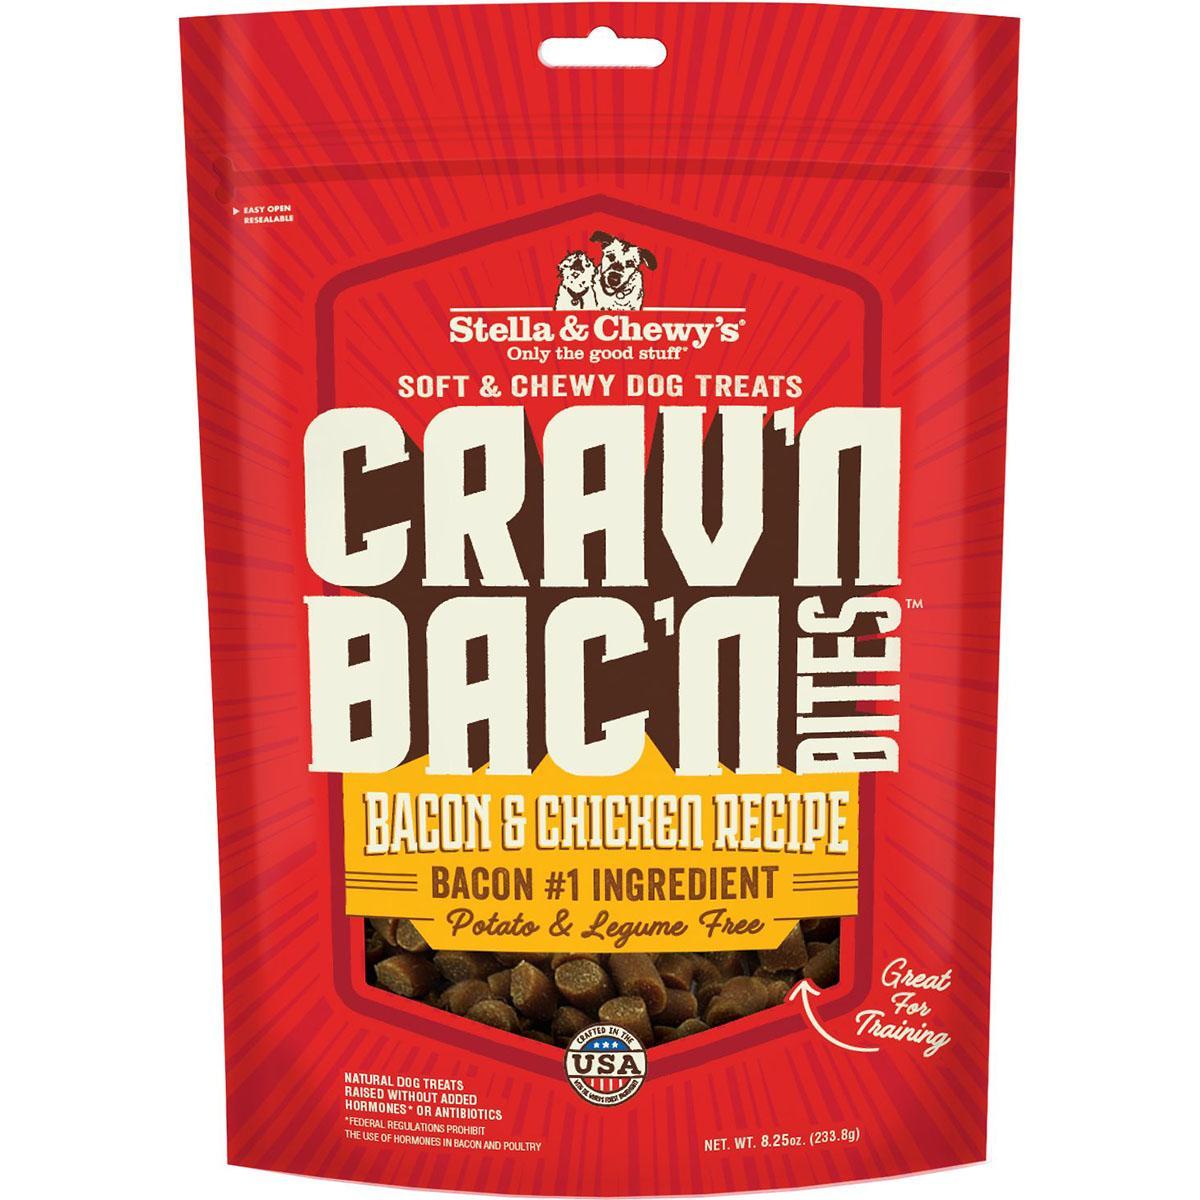 Stella & Chewy's Crav'n Bac'n Bites Bacon & Chicken Recipe Dog Treats